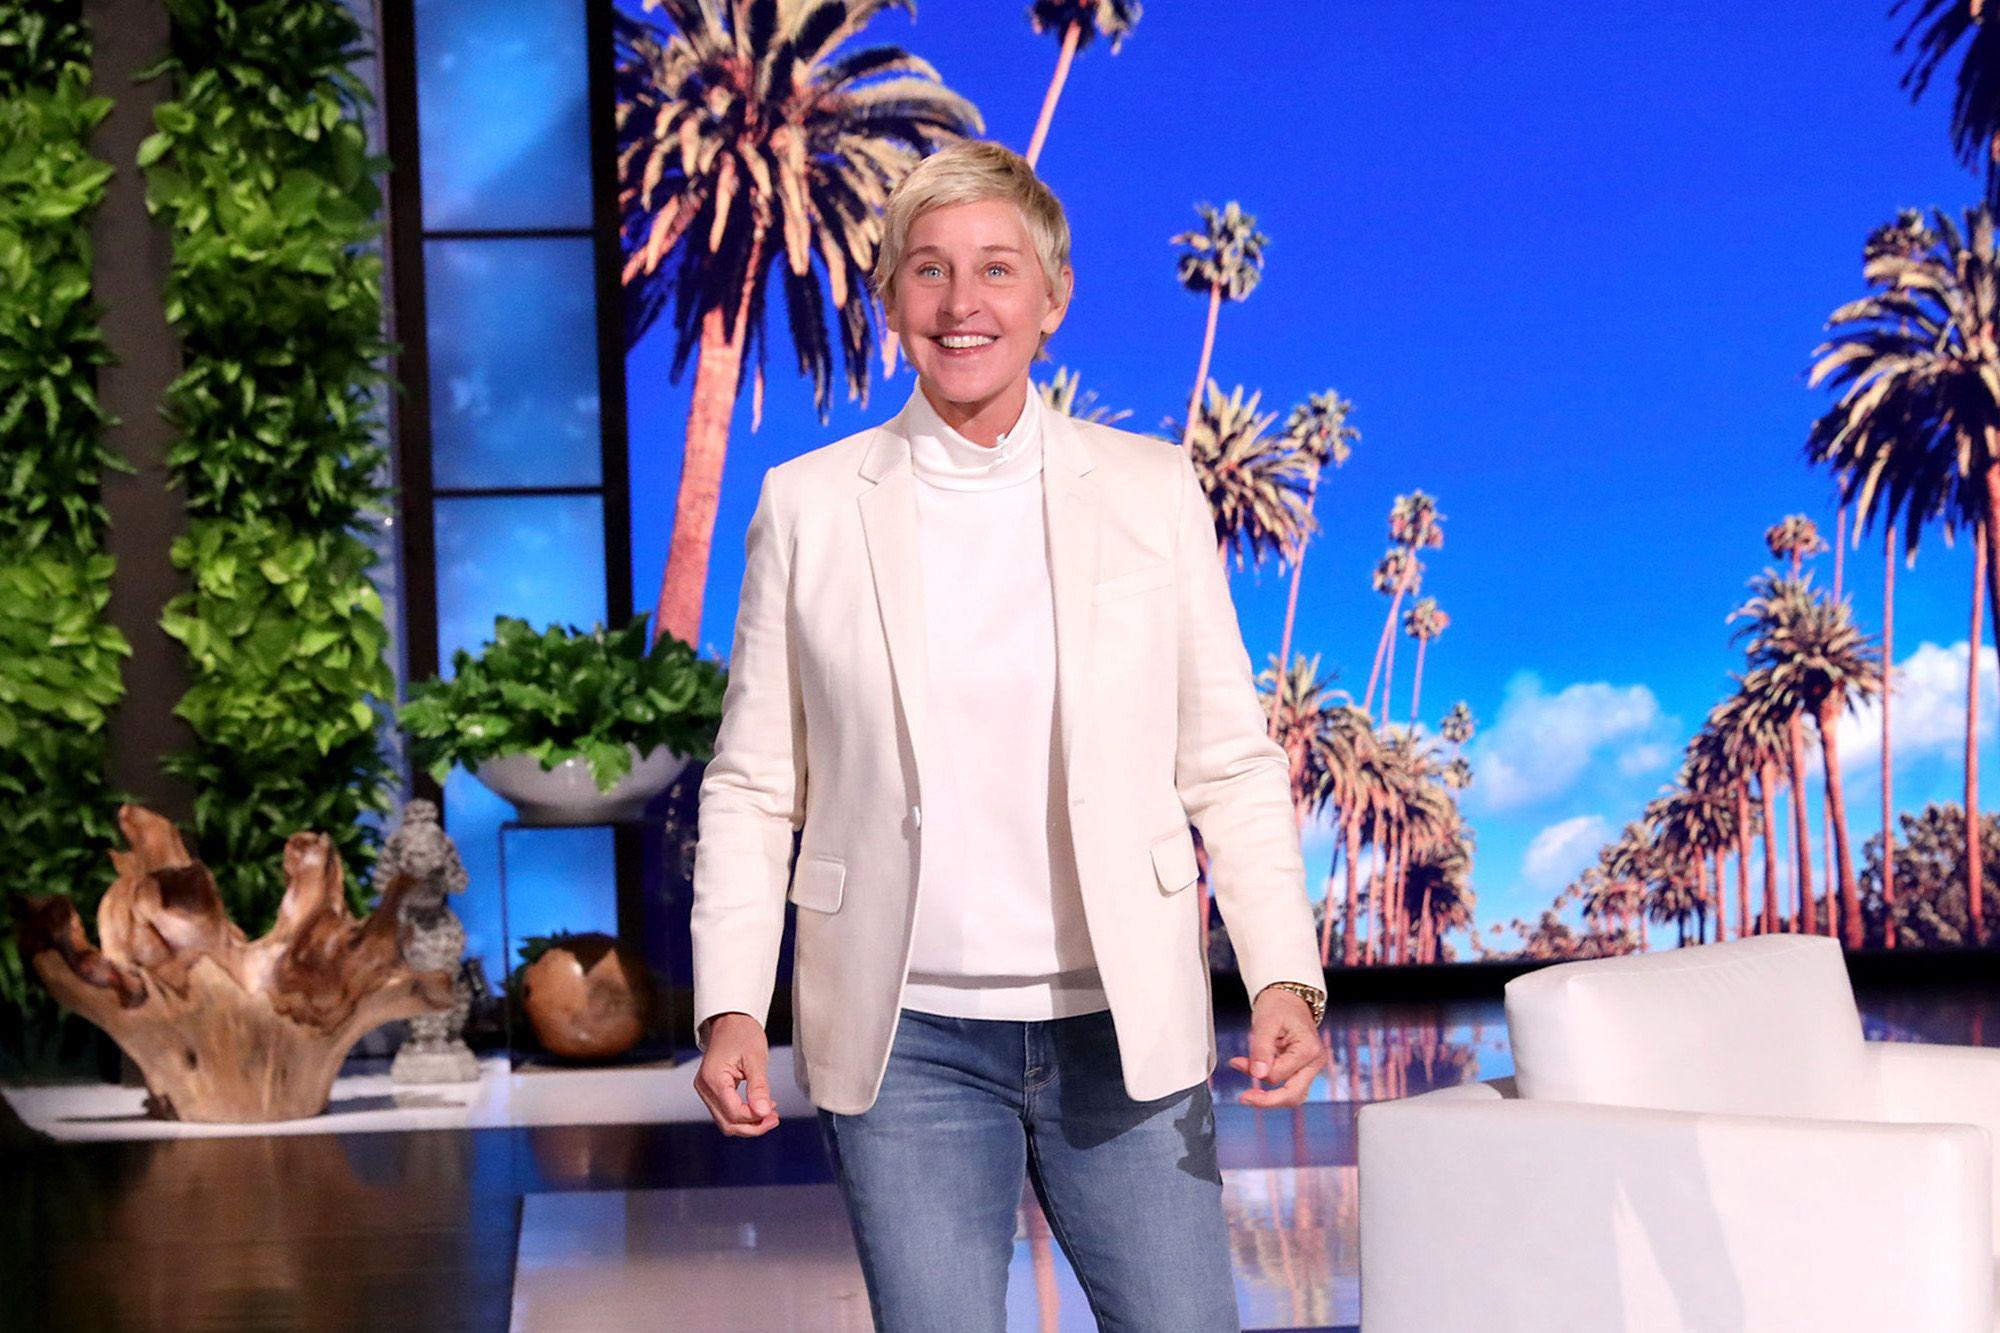 Ellen DeGeneres Addresses Toxic Workplace Allegations In First Monologue Since Hiatus | ETCanada.com